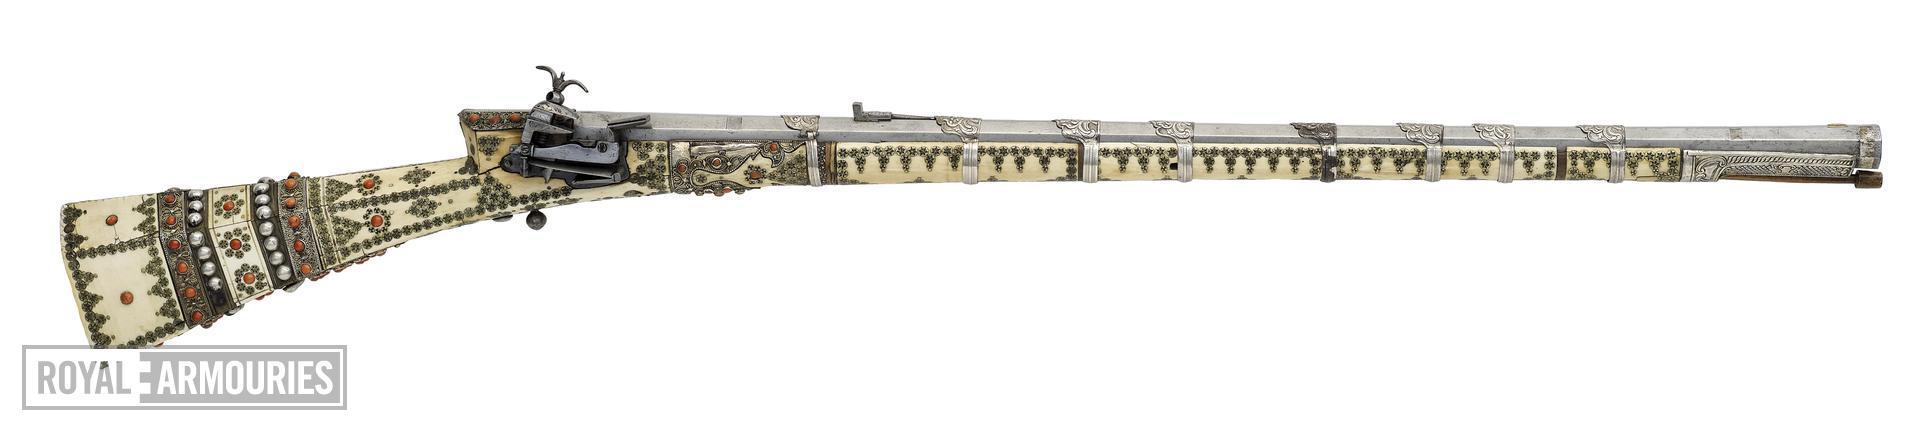 Miquelet lock rifle (cakmakli tufek)